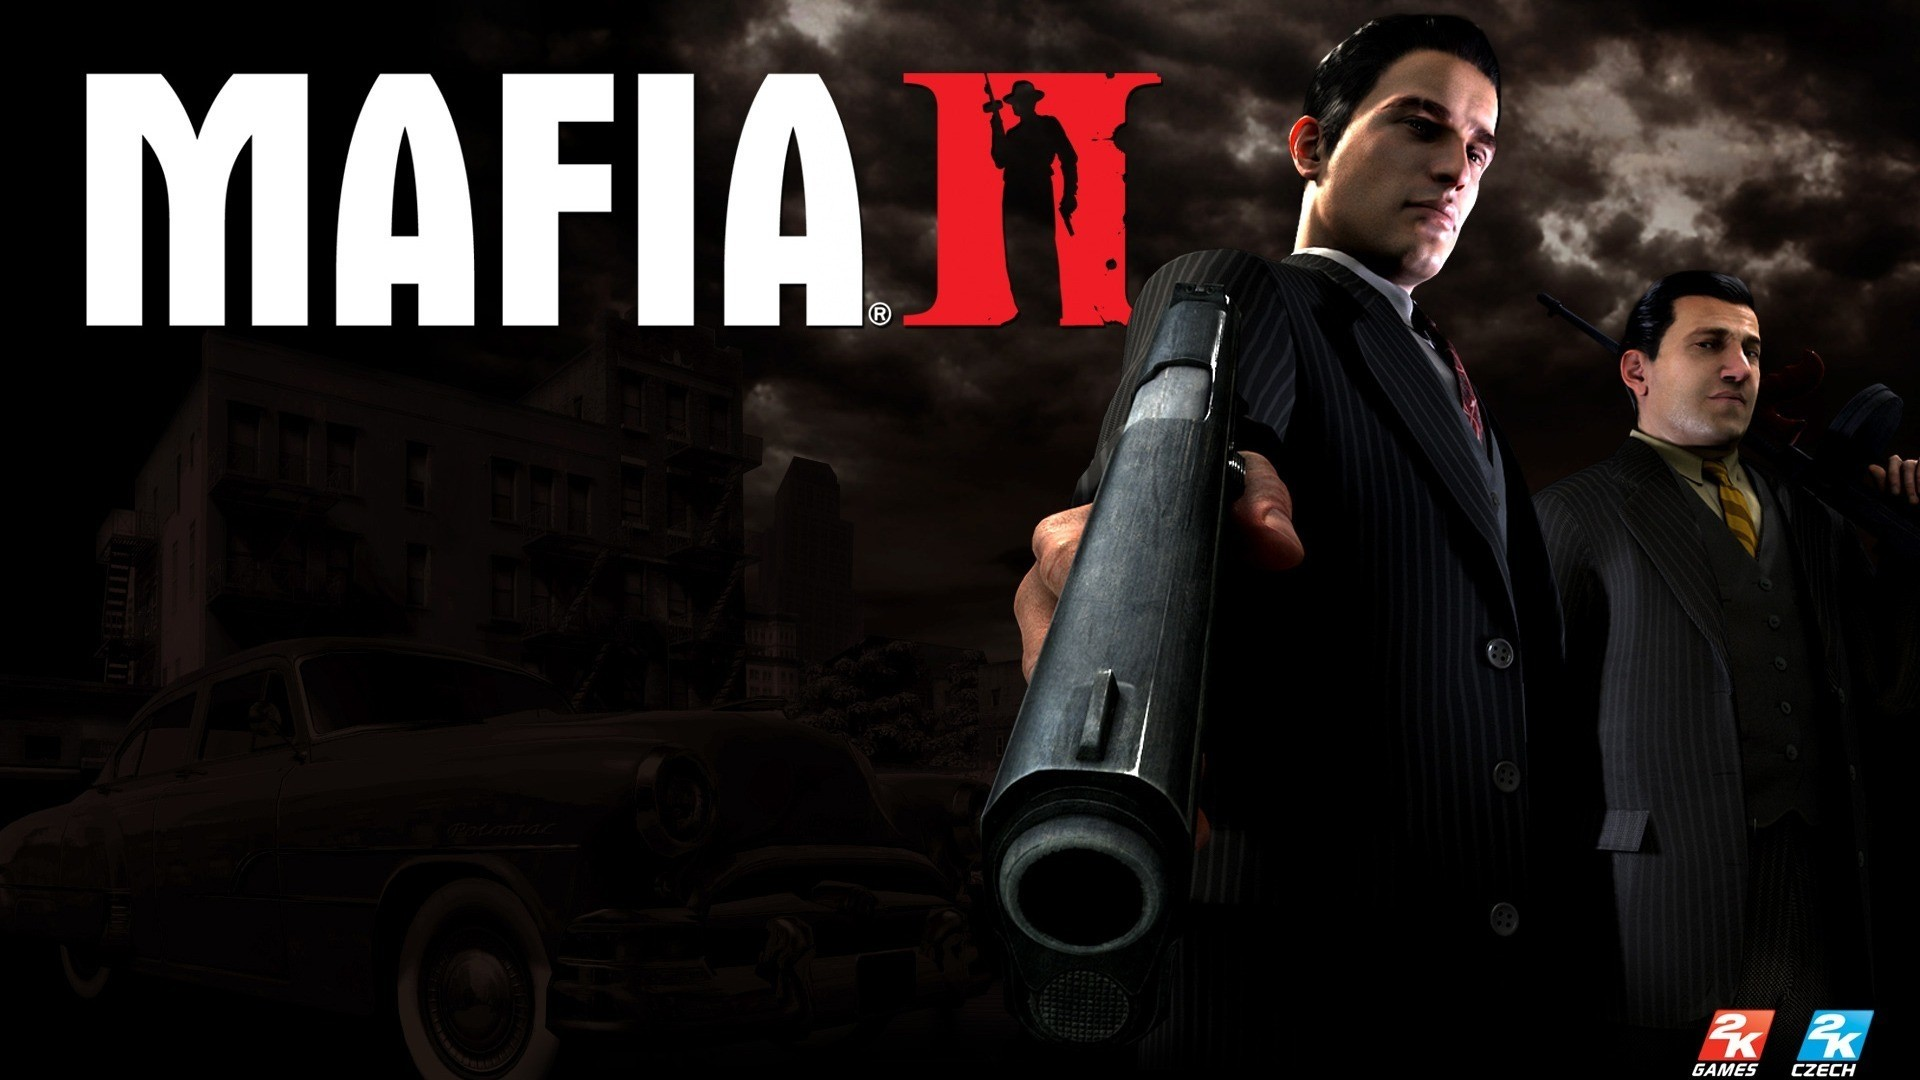 Mafia Wallpaper Full Hd 81 Images